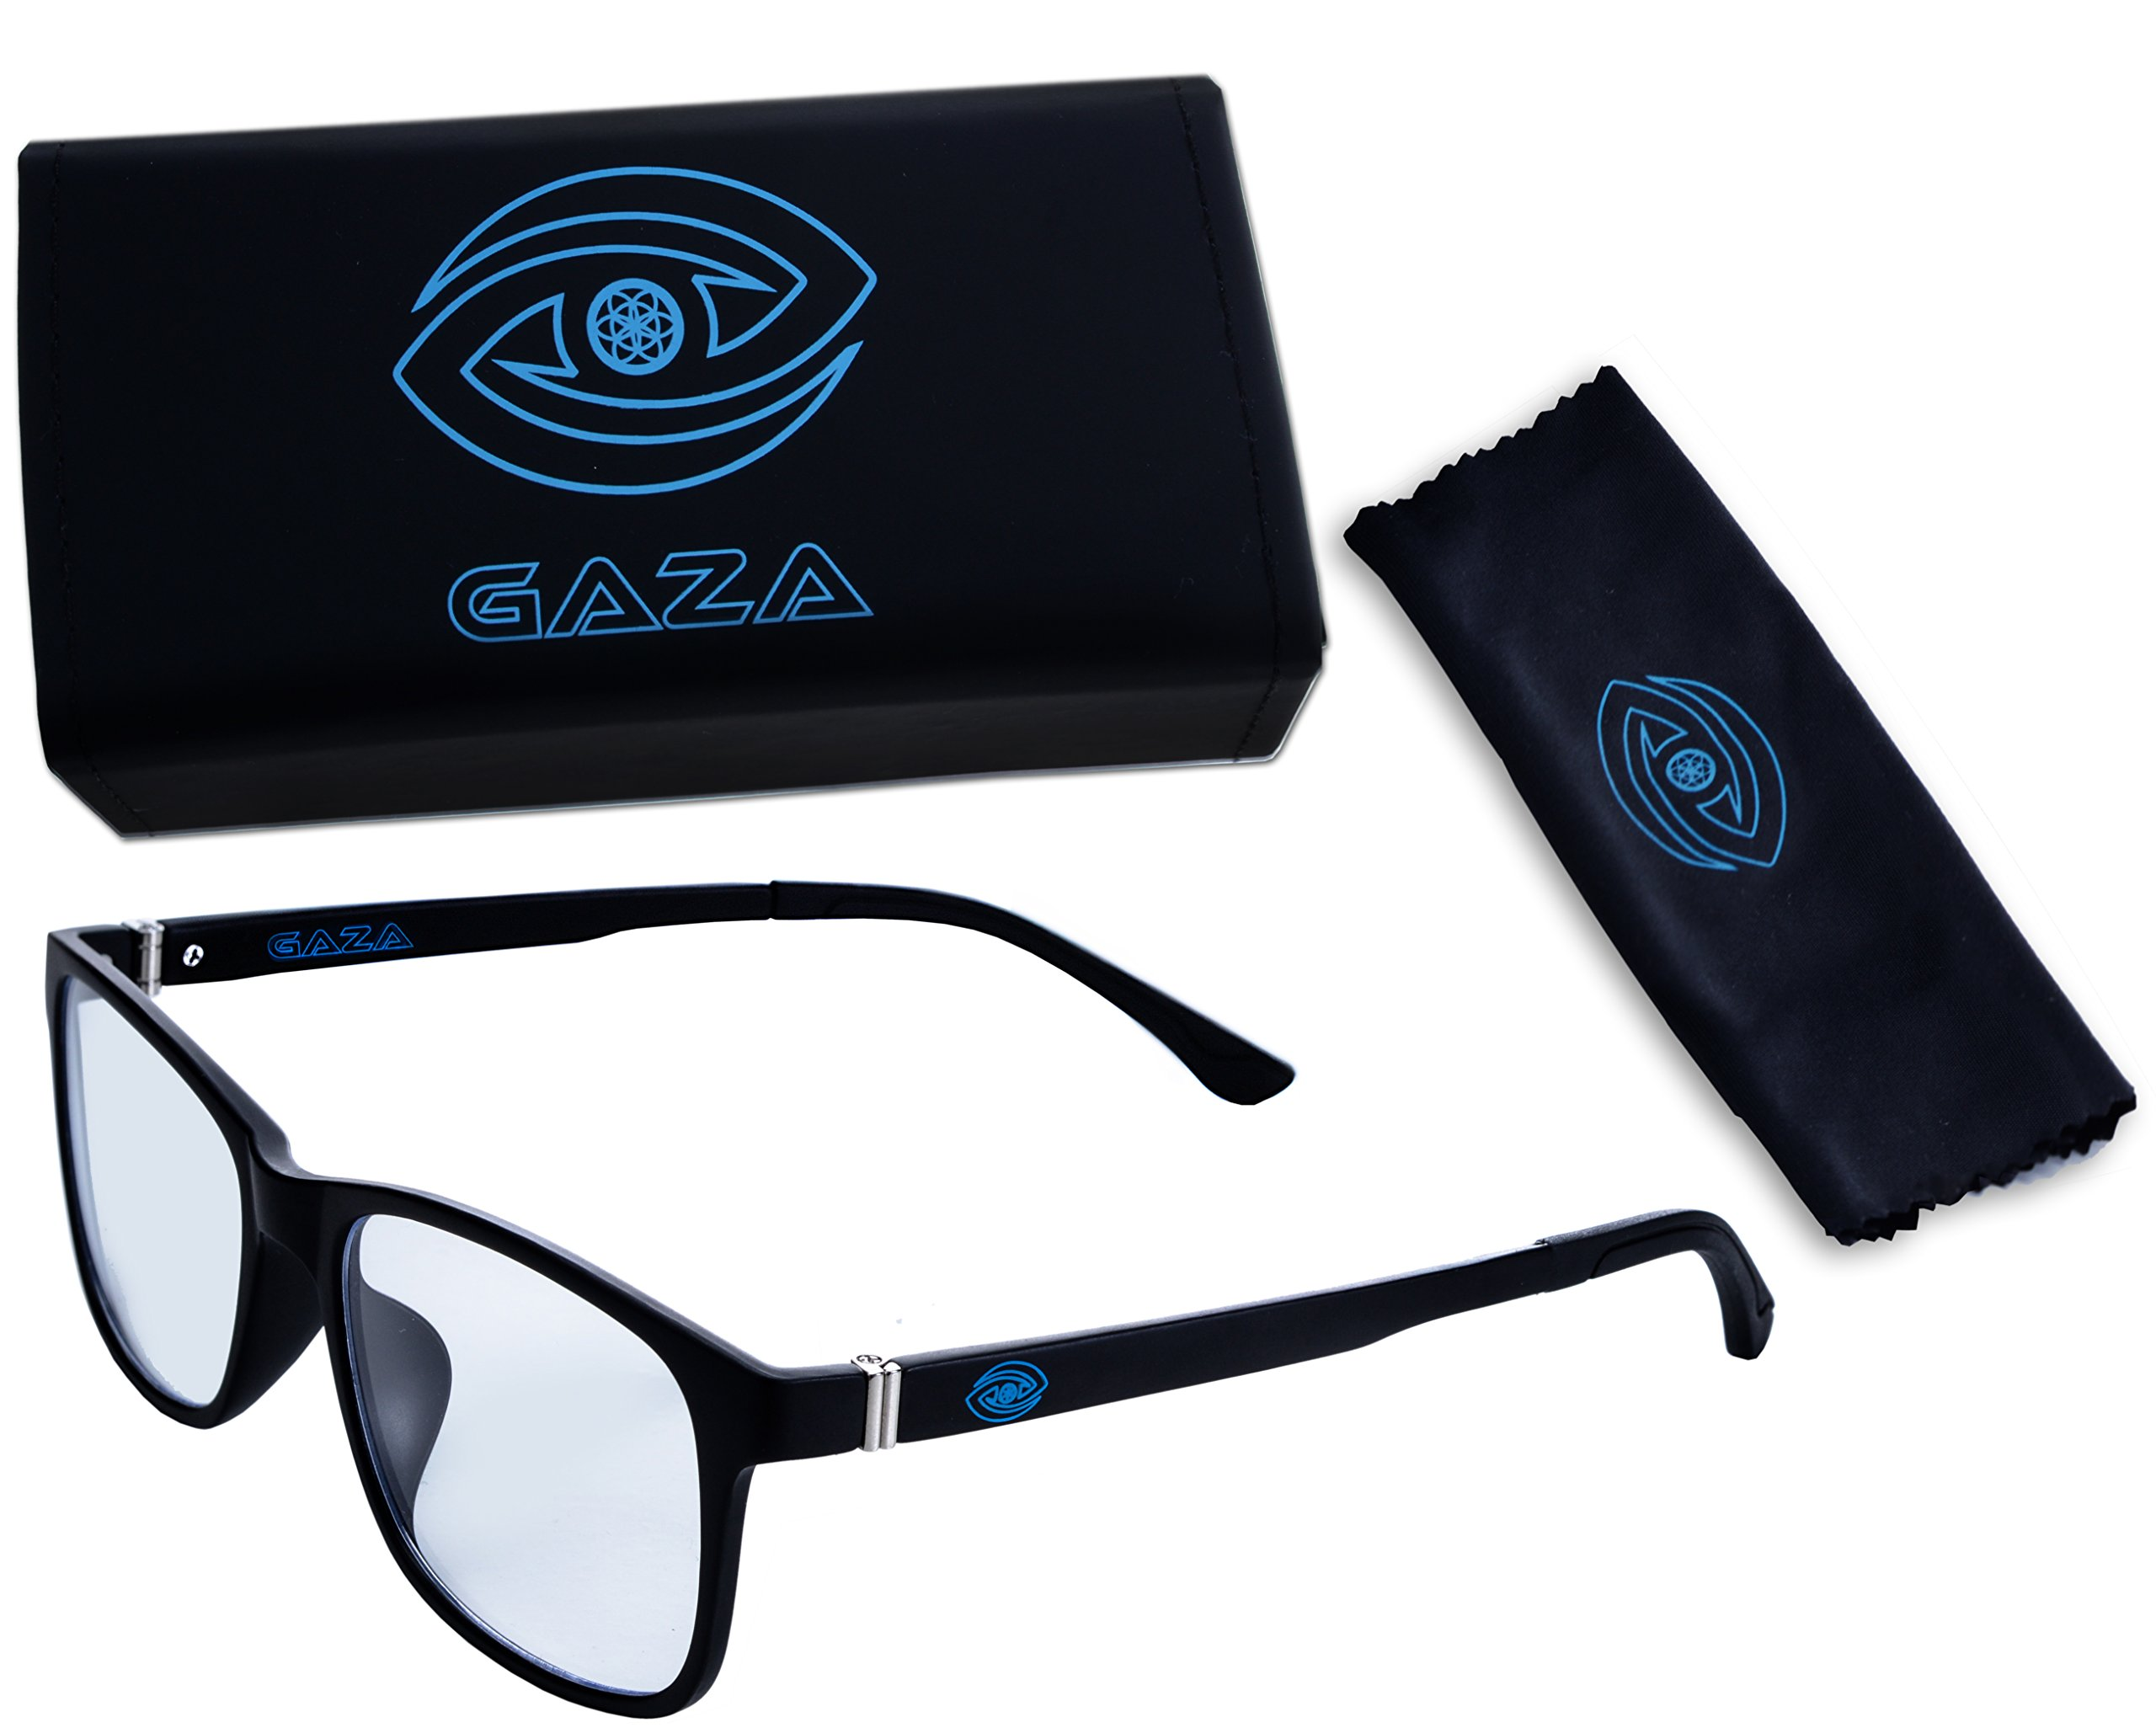 fa3c45294907 GAZA Computer Glasses - Blue Light Blocking Glasses for Reducing Digital  Eyestrain/Fatigue, Better